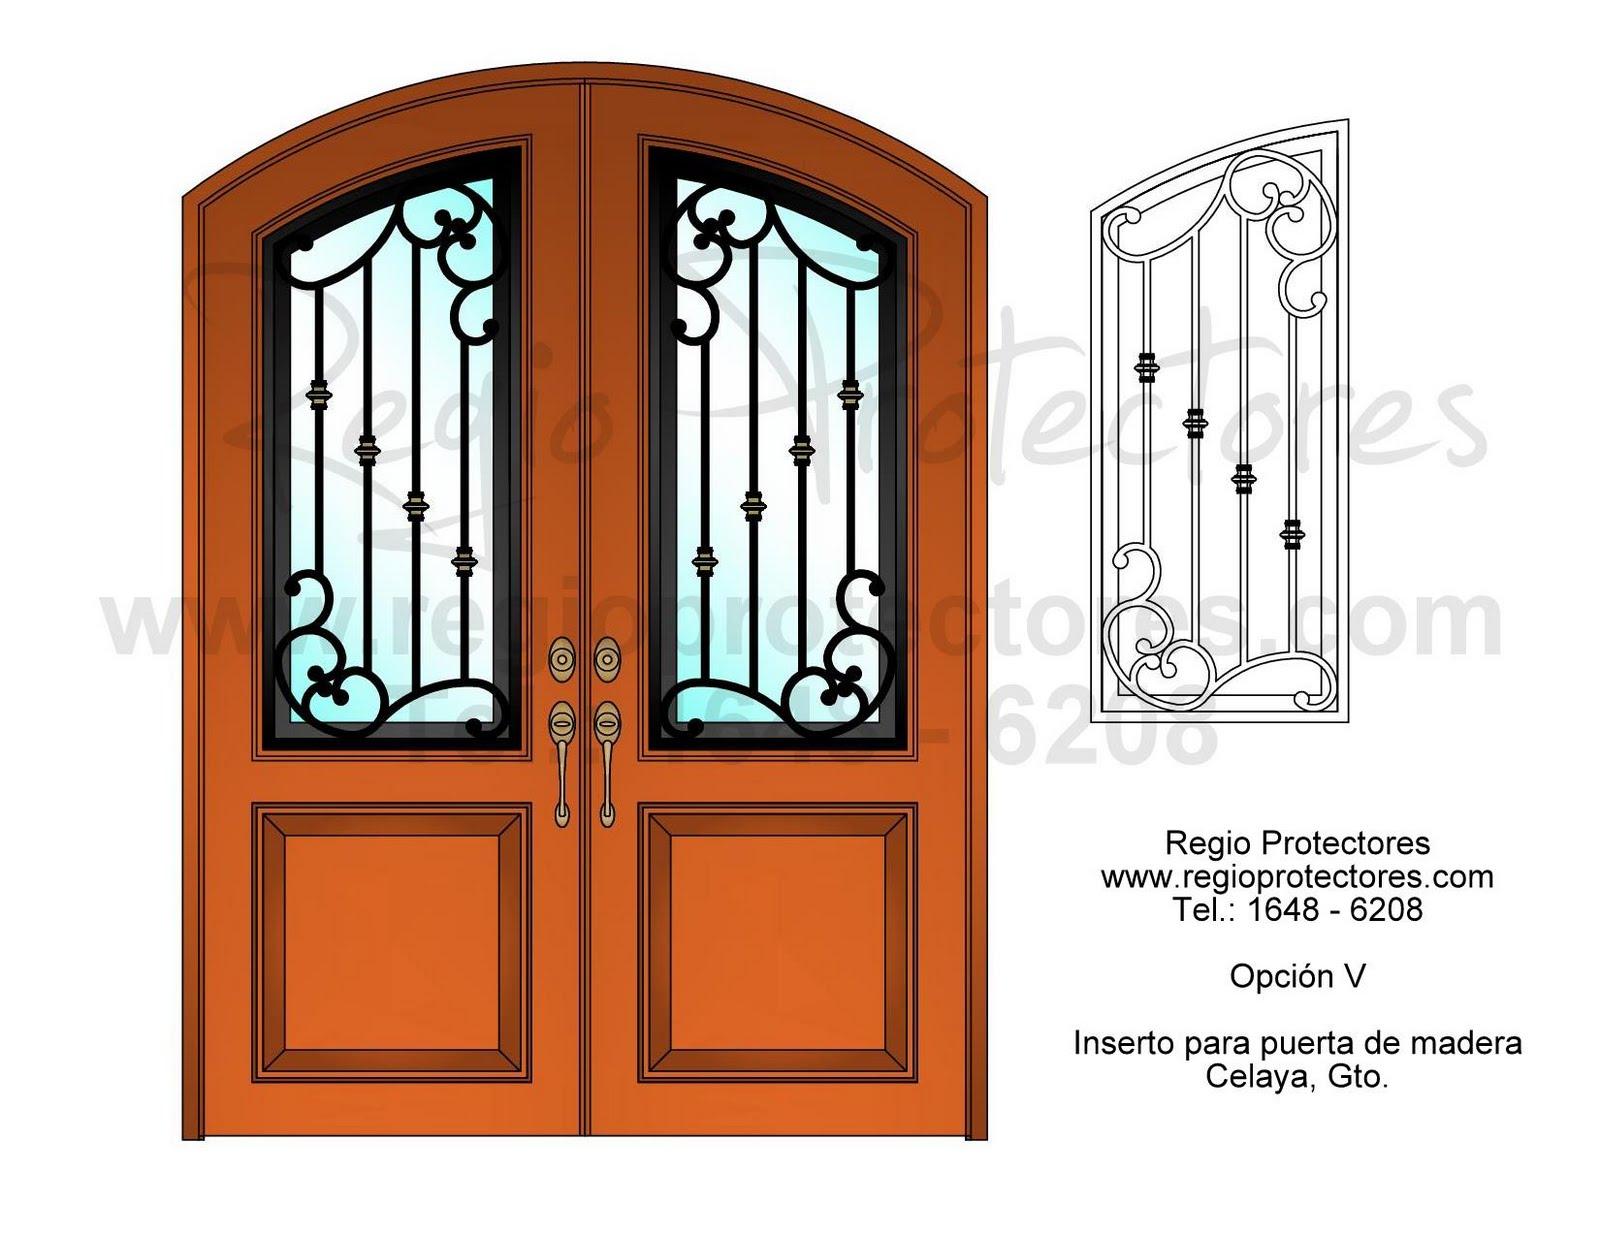 Pin puertas ventanas madera antiguas buenos aires casa for Puertas viejas